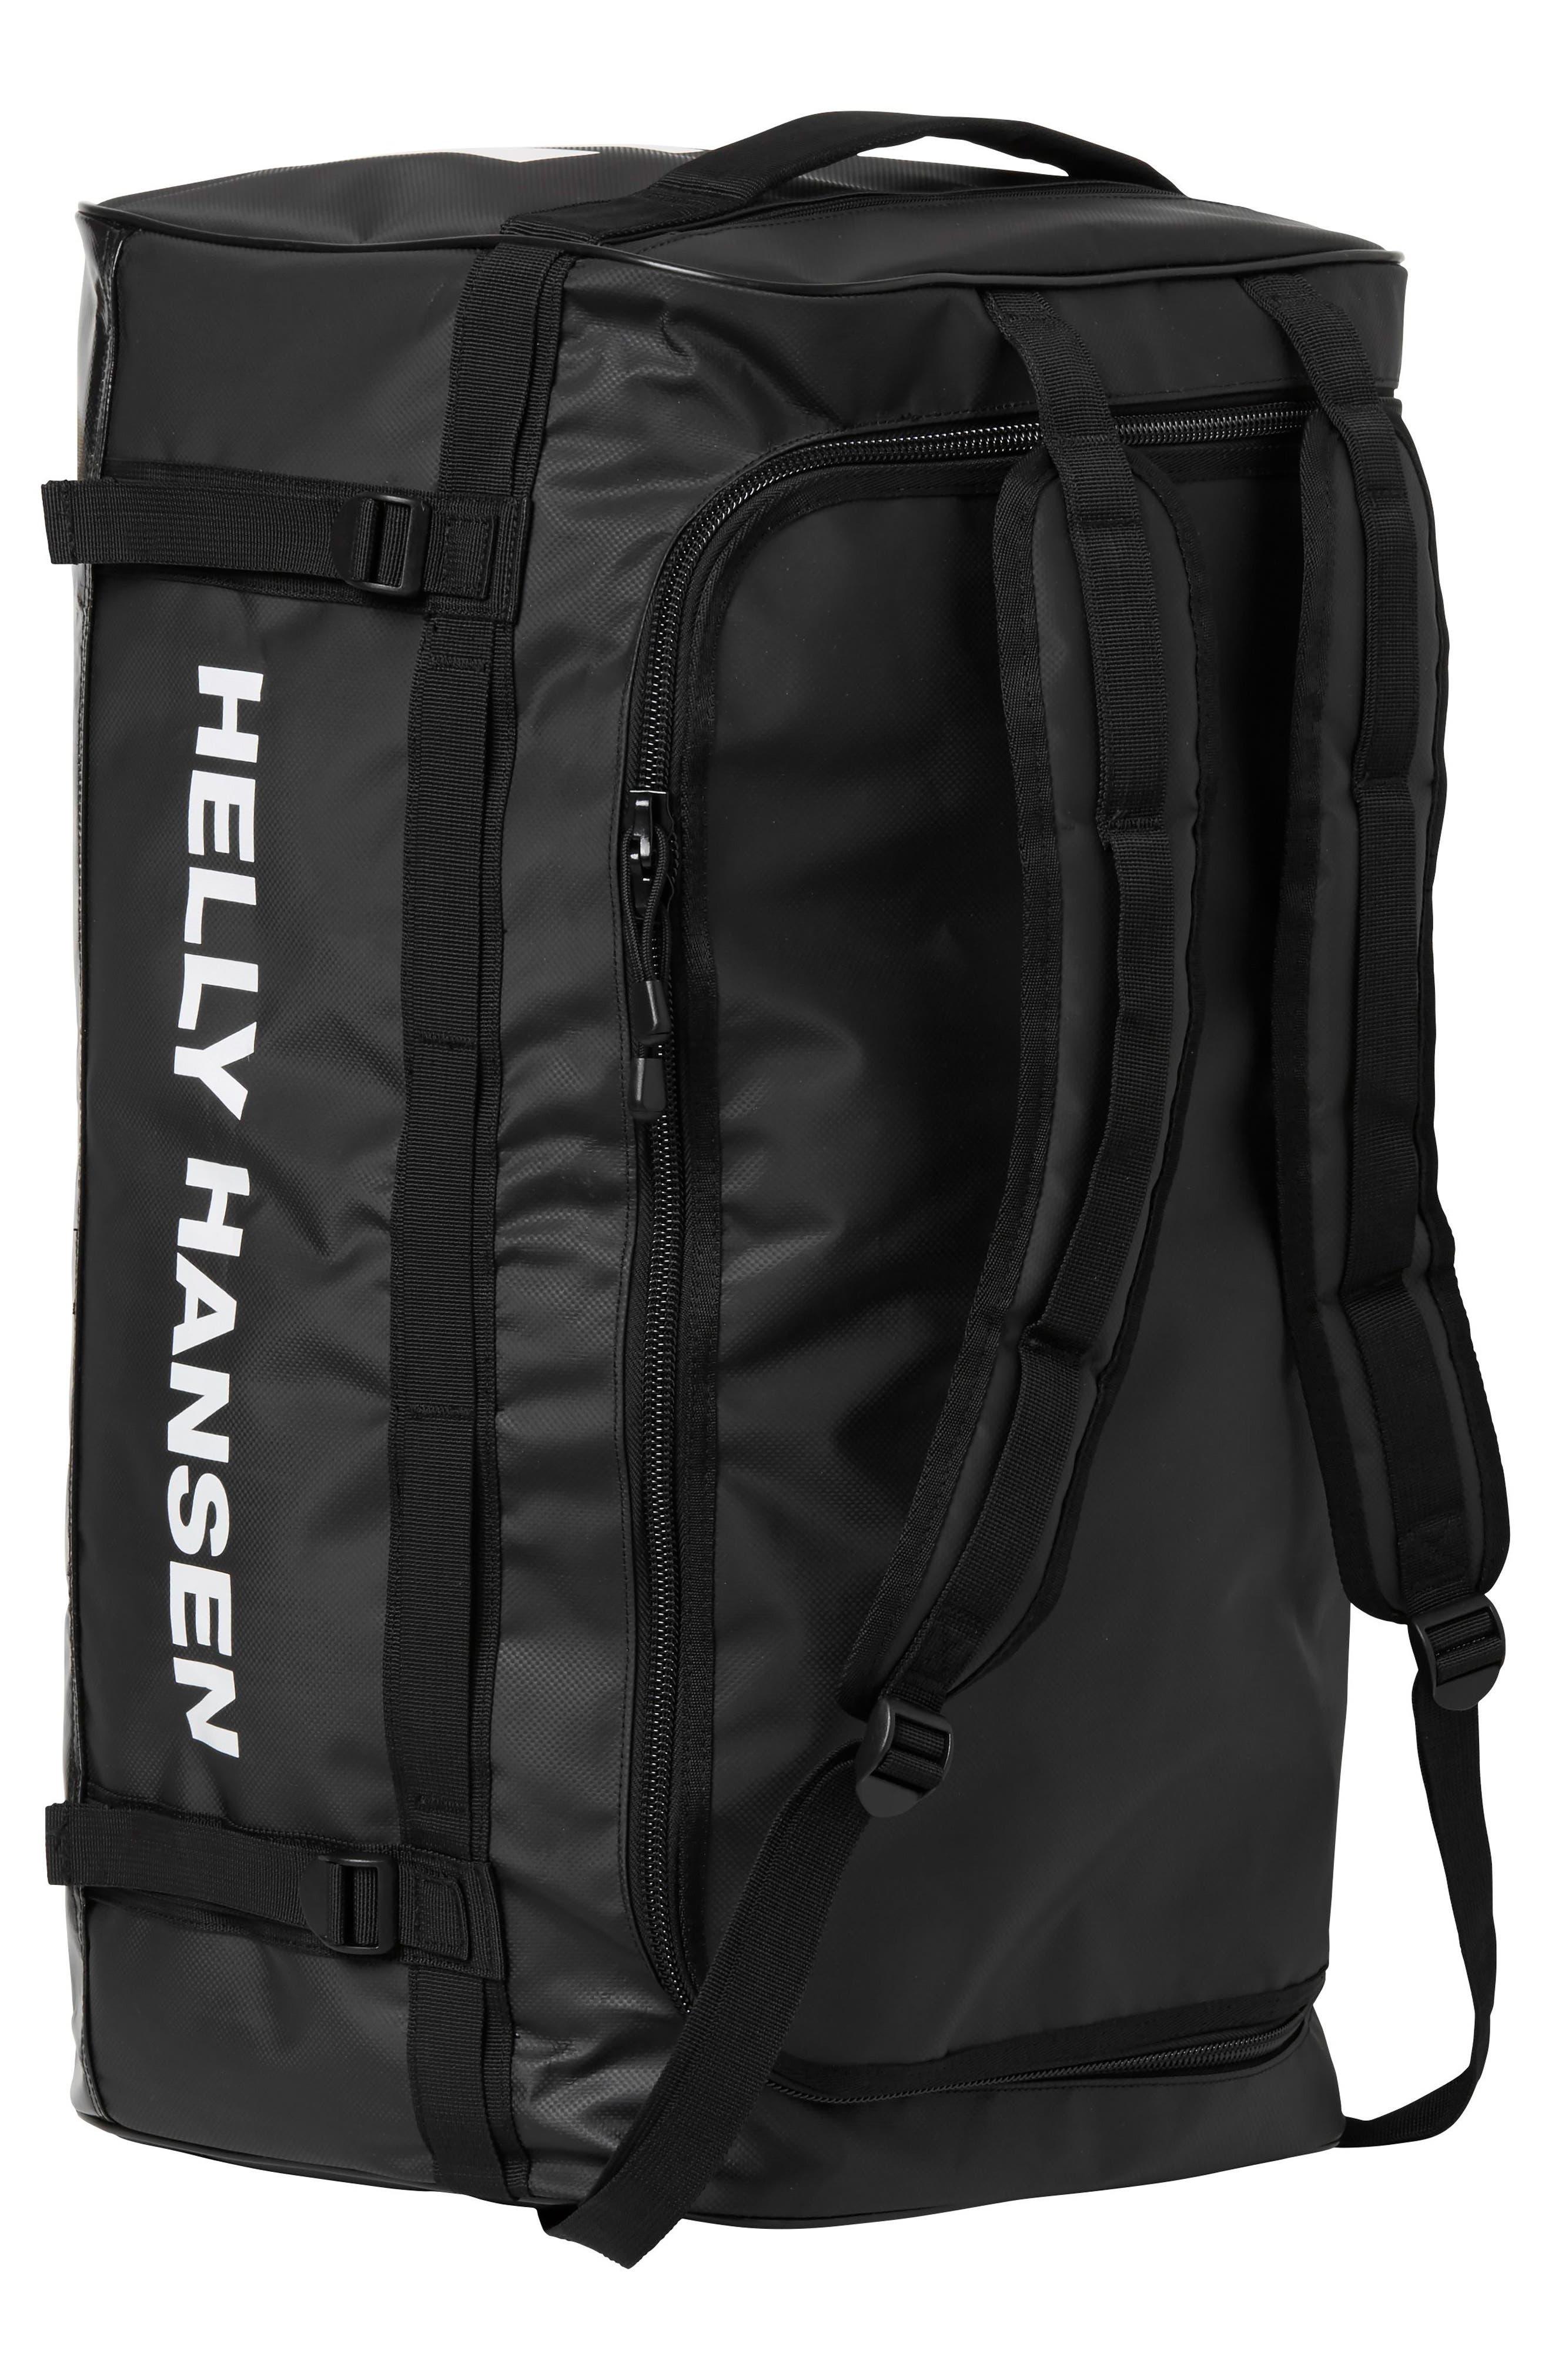 New Classic Small Duffel Bag,                             Alternate thumbnail 4, color,                             BLACK